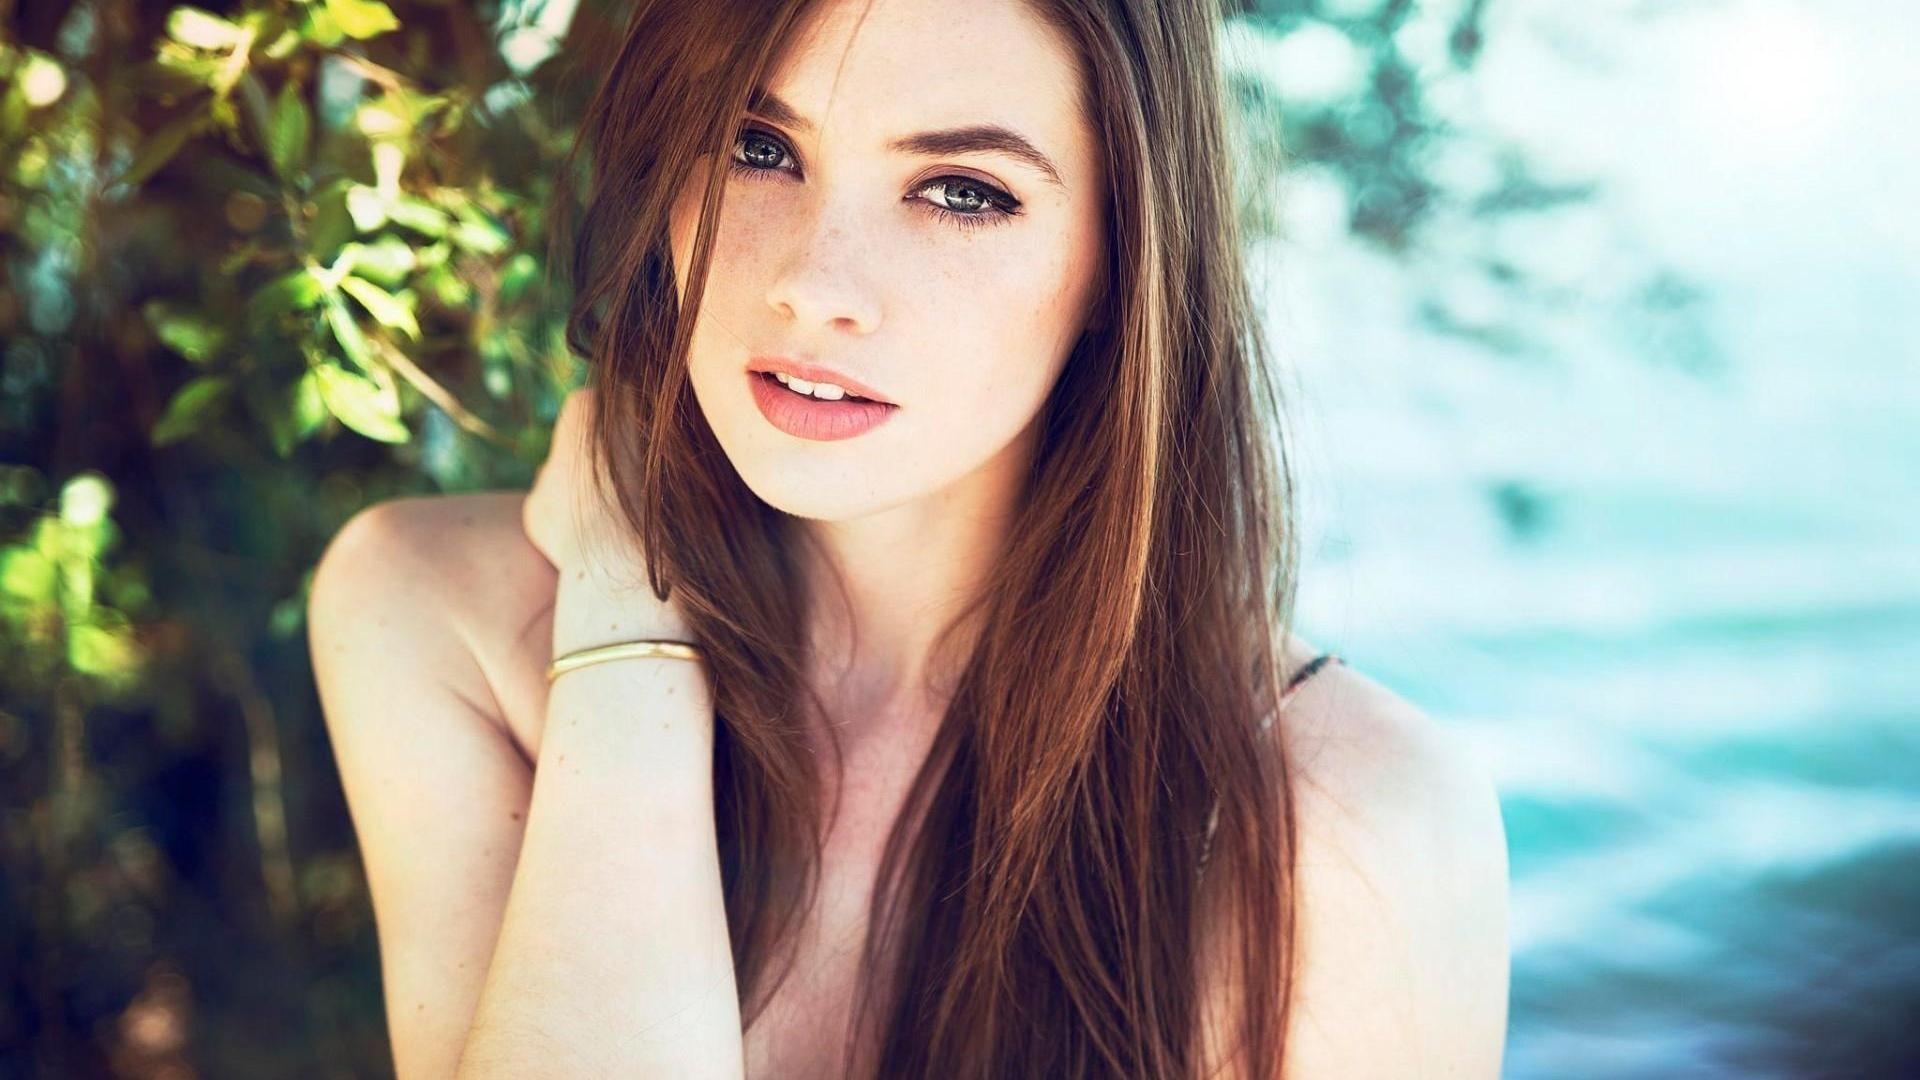 Beautiful Woman Wallpapers Top Free Beautiful Woman